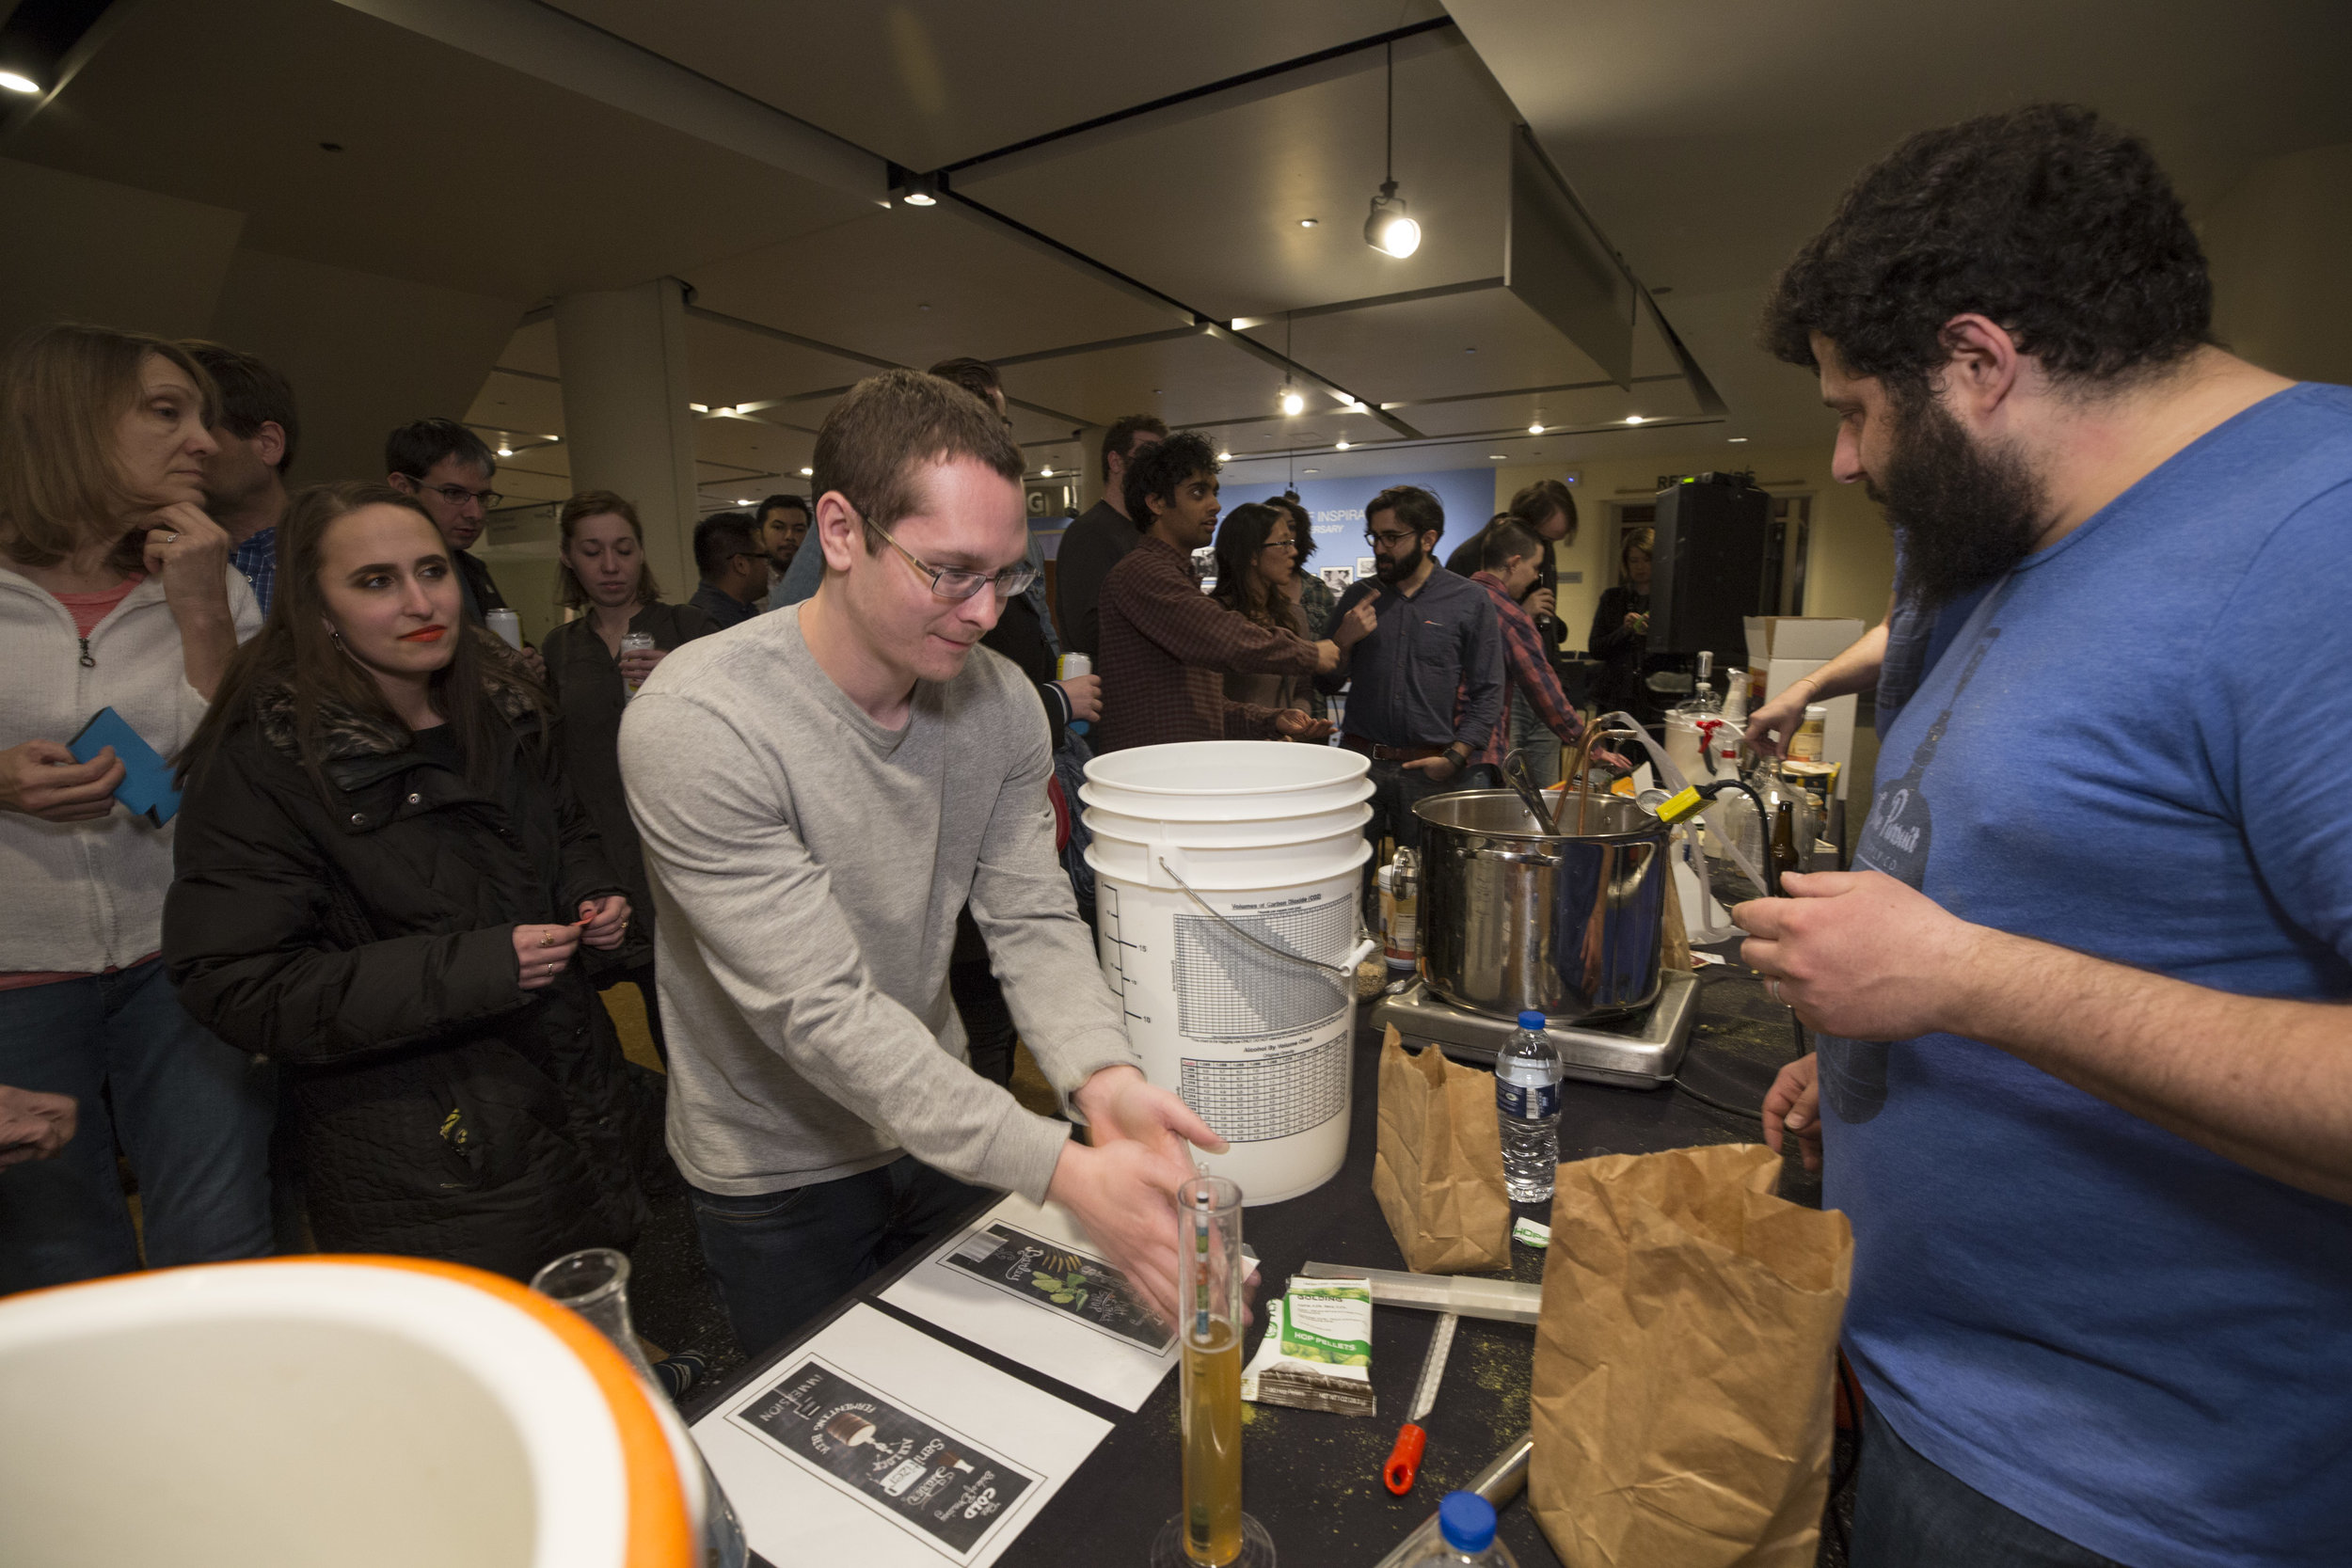 Pursuit Supply teaching beer brewing basics at the Adler Planetarium